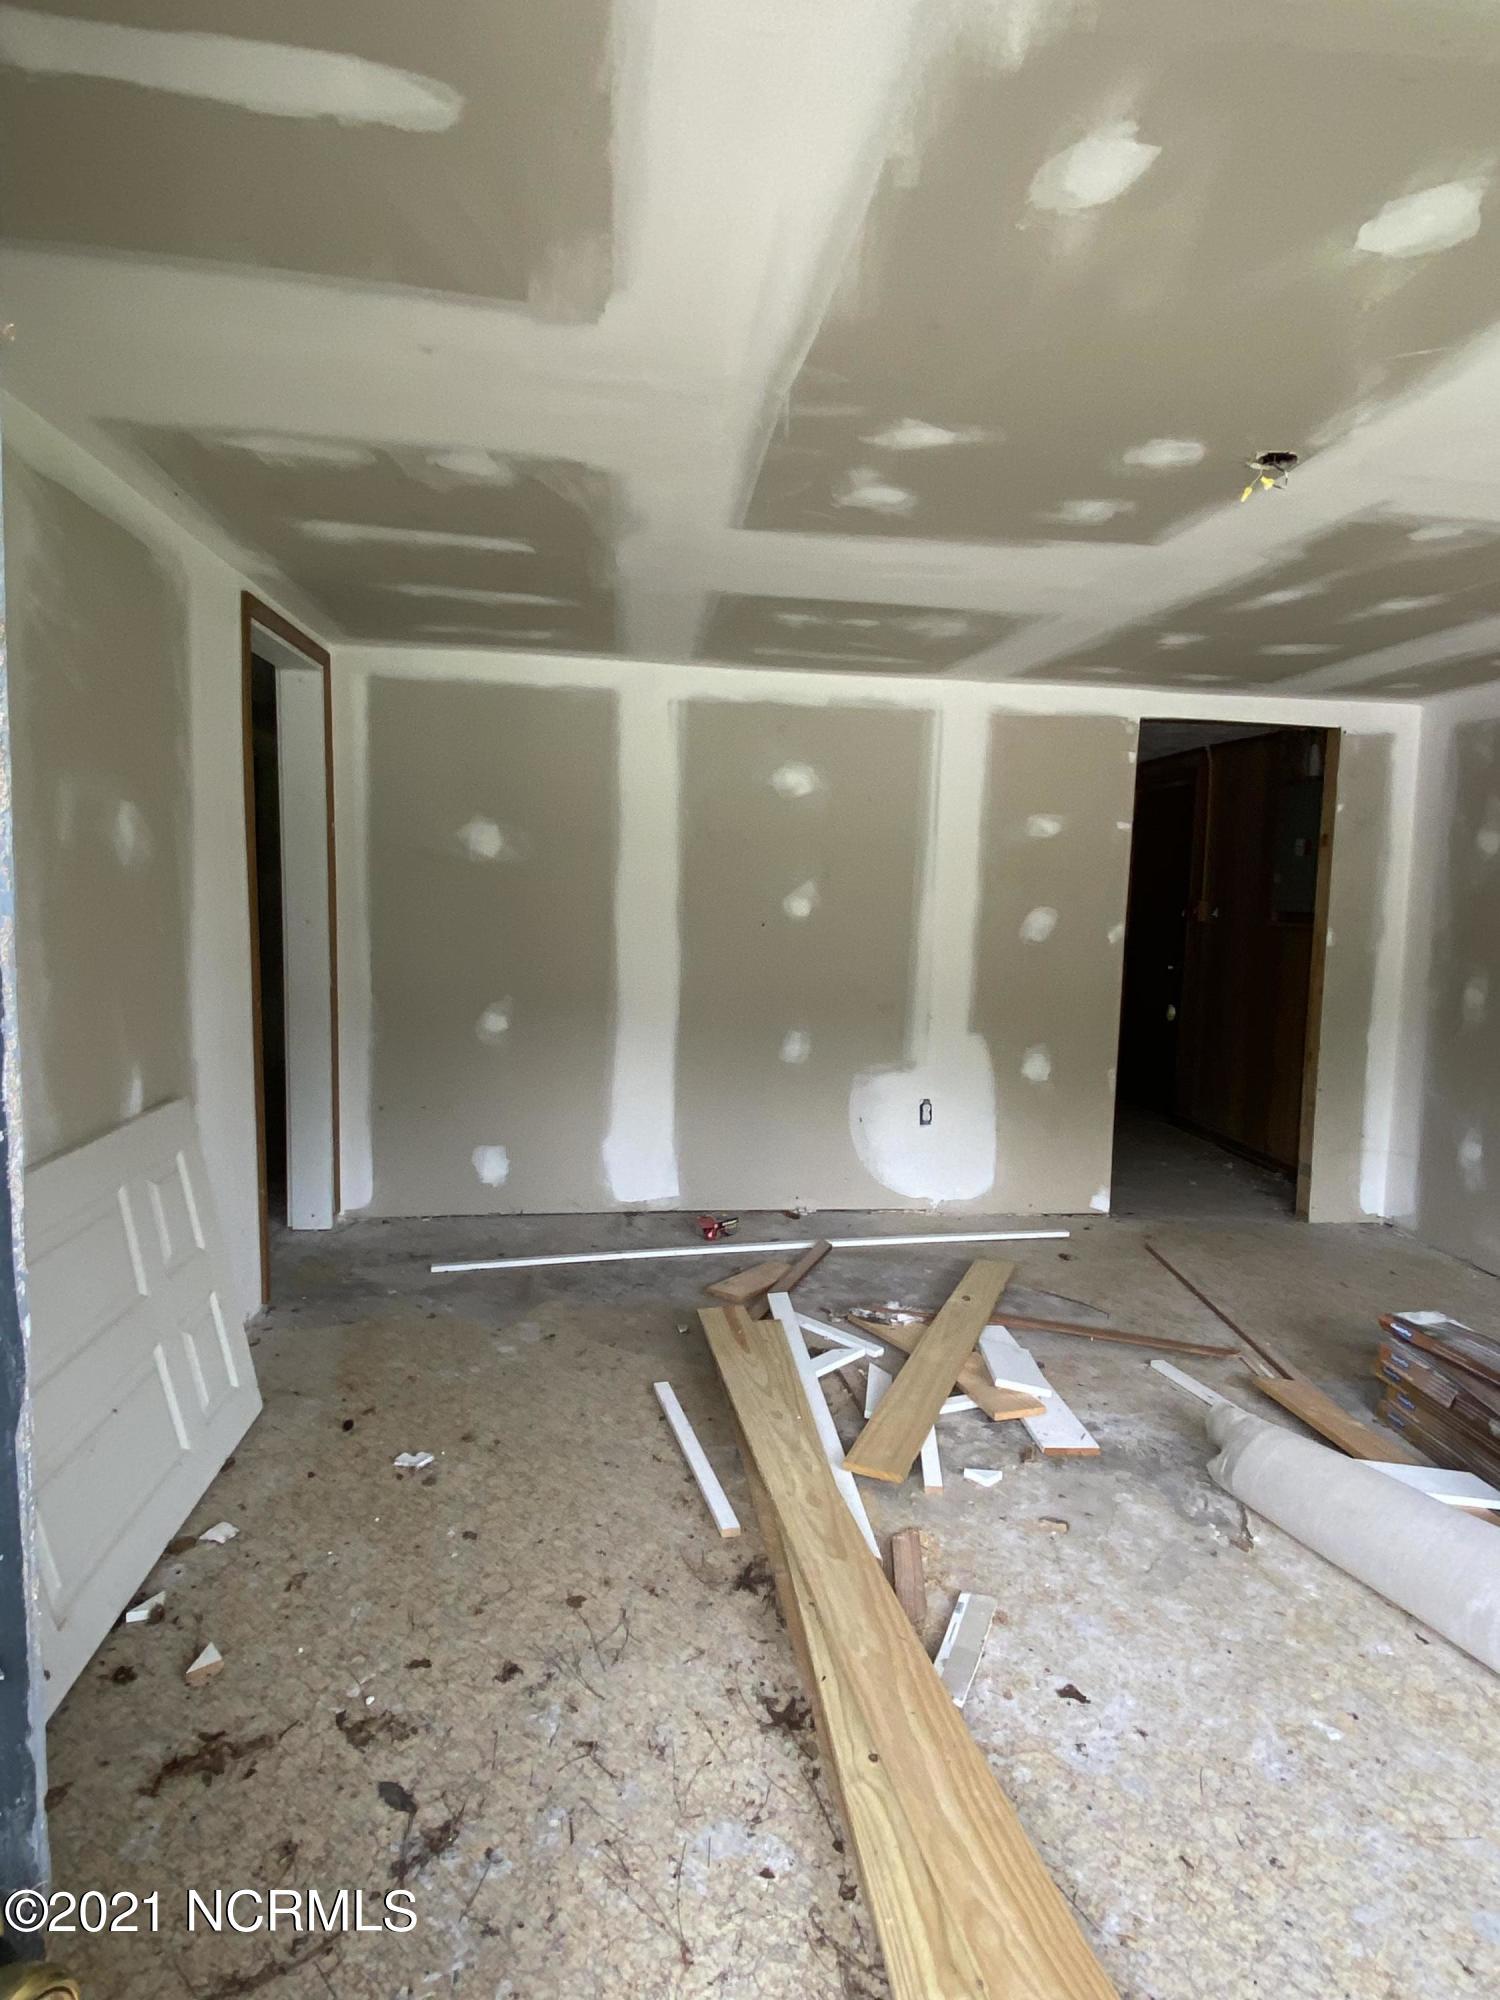 573 Kinston Highway, Richlands, North Carolina 28574, 3 Bedrooms Bedrooms, 5 Rooms Rooms,2 BathroomsBathrooms,Single family residence,For sale,Kinston,100275861